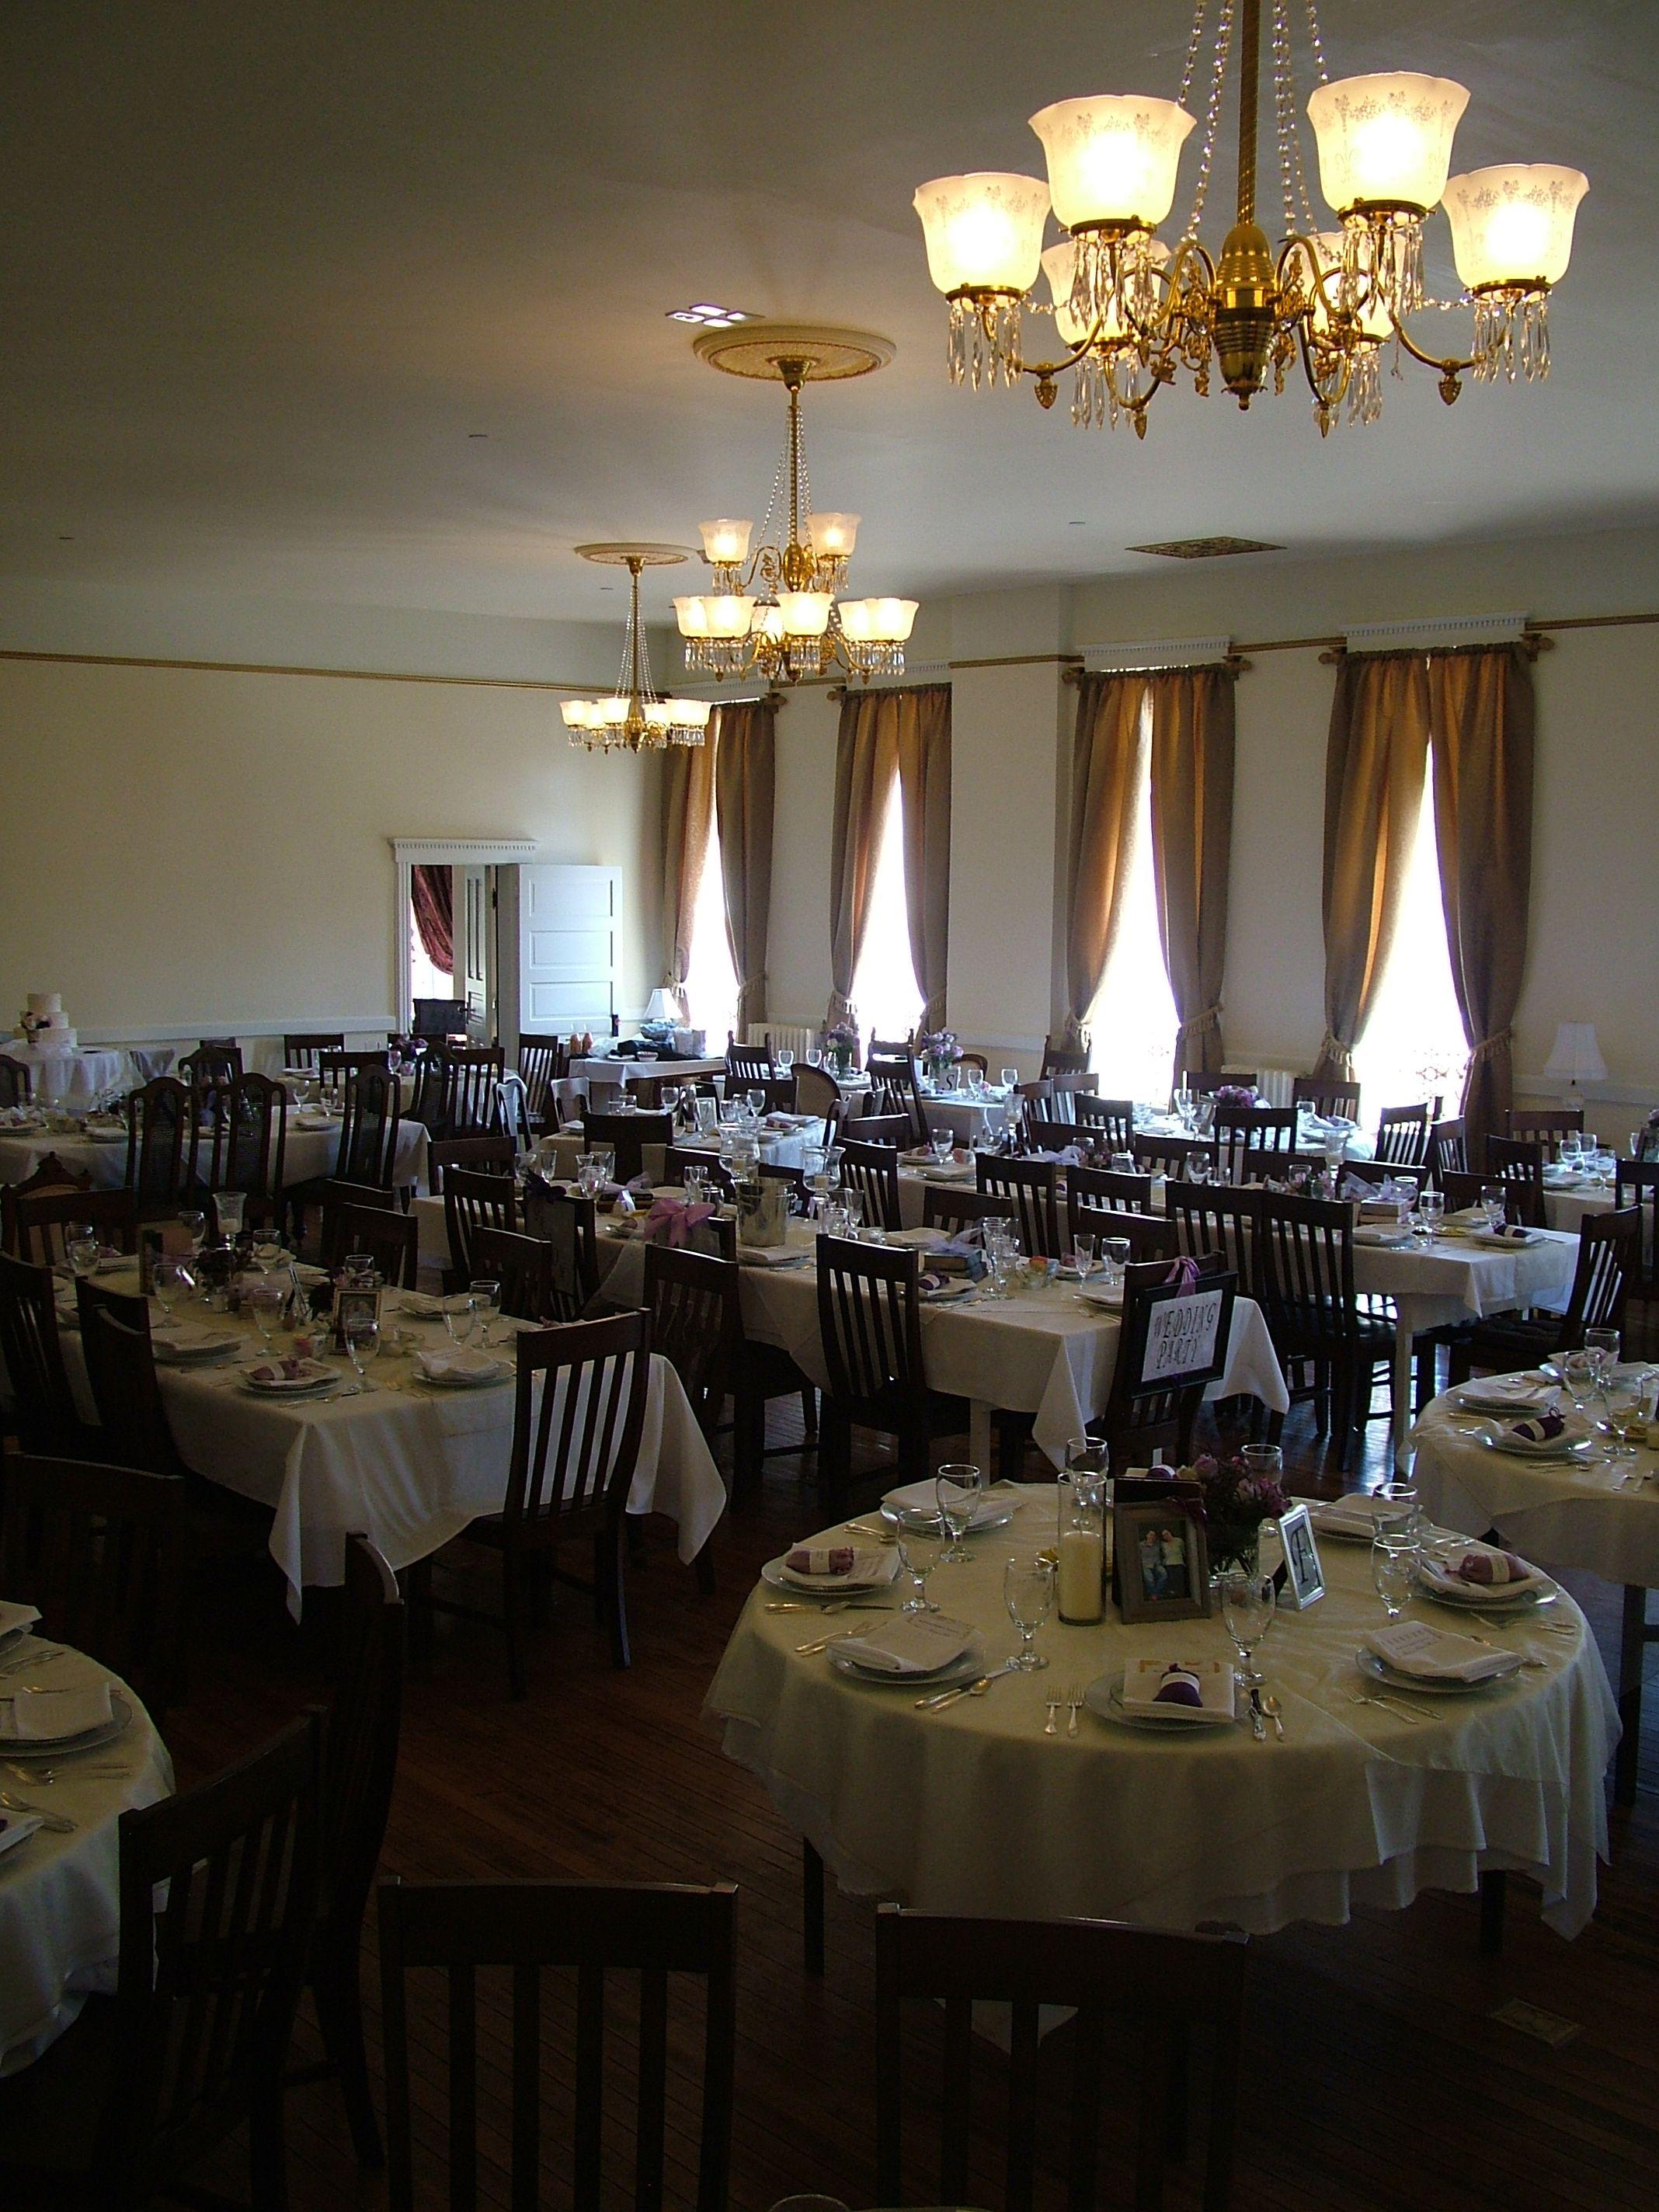 Martin Mason Hotel 1898 Ballroom 33 Deadwood St Sd 57732